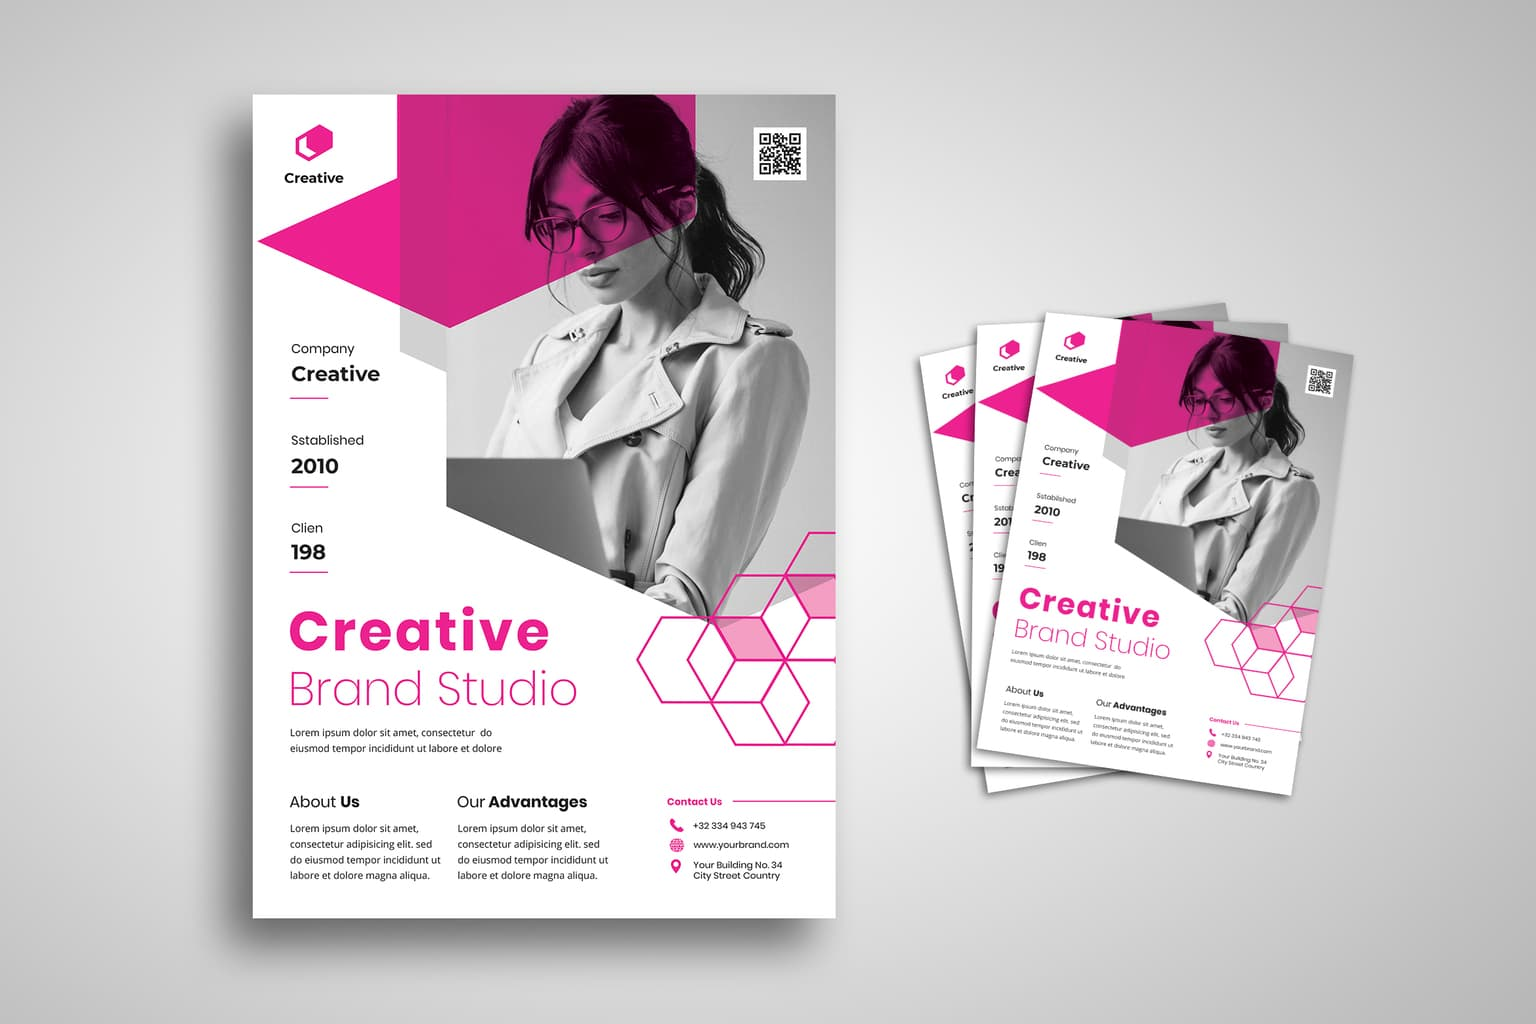 flyer creative brand studio 1